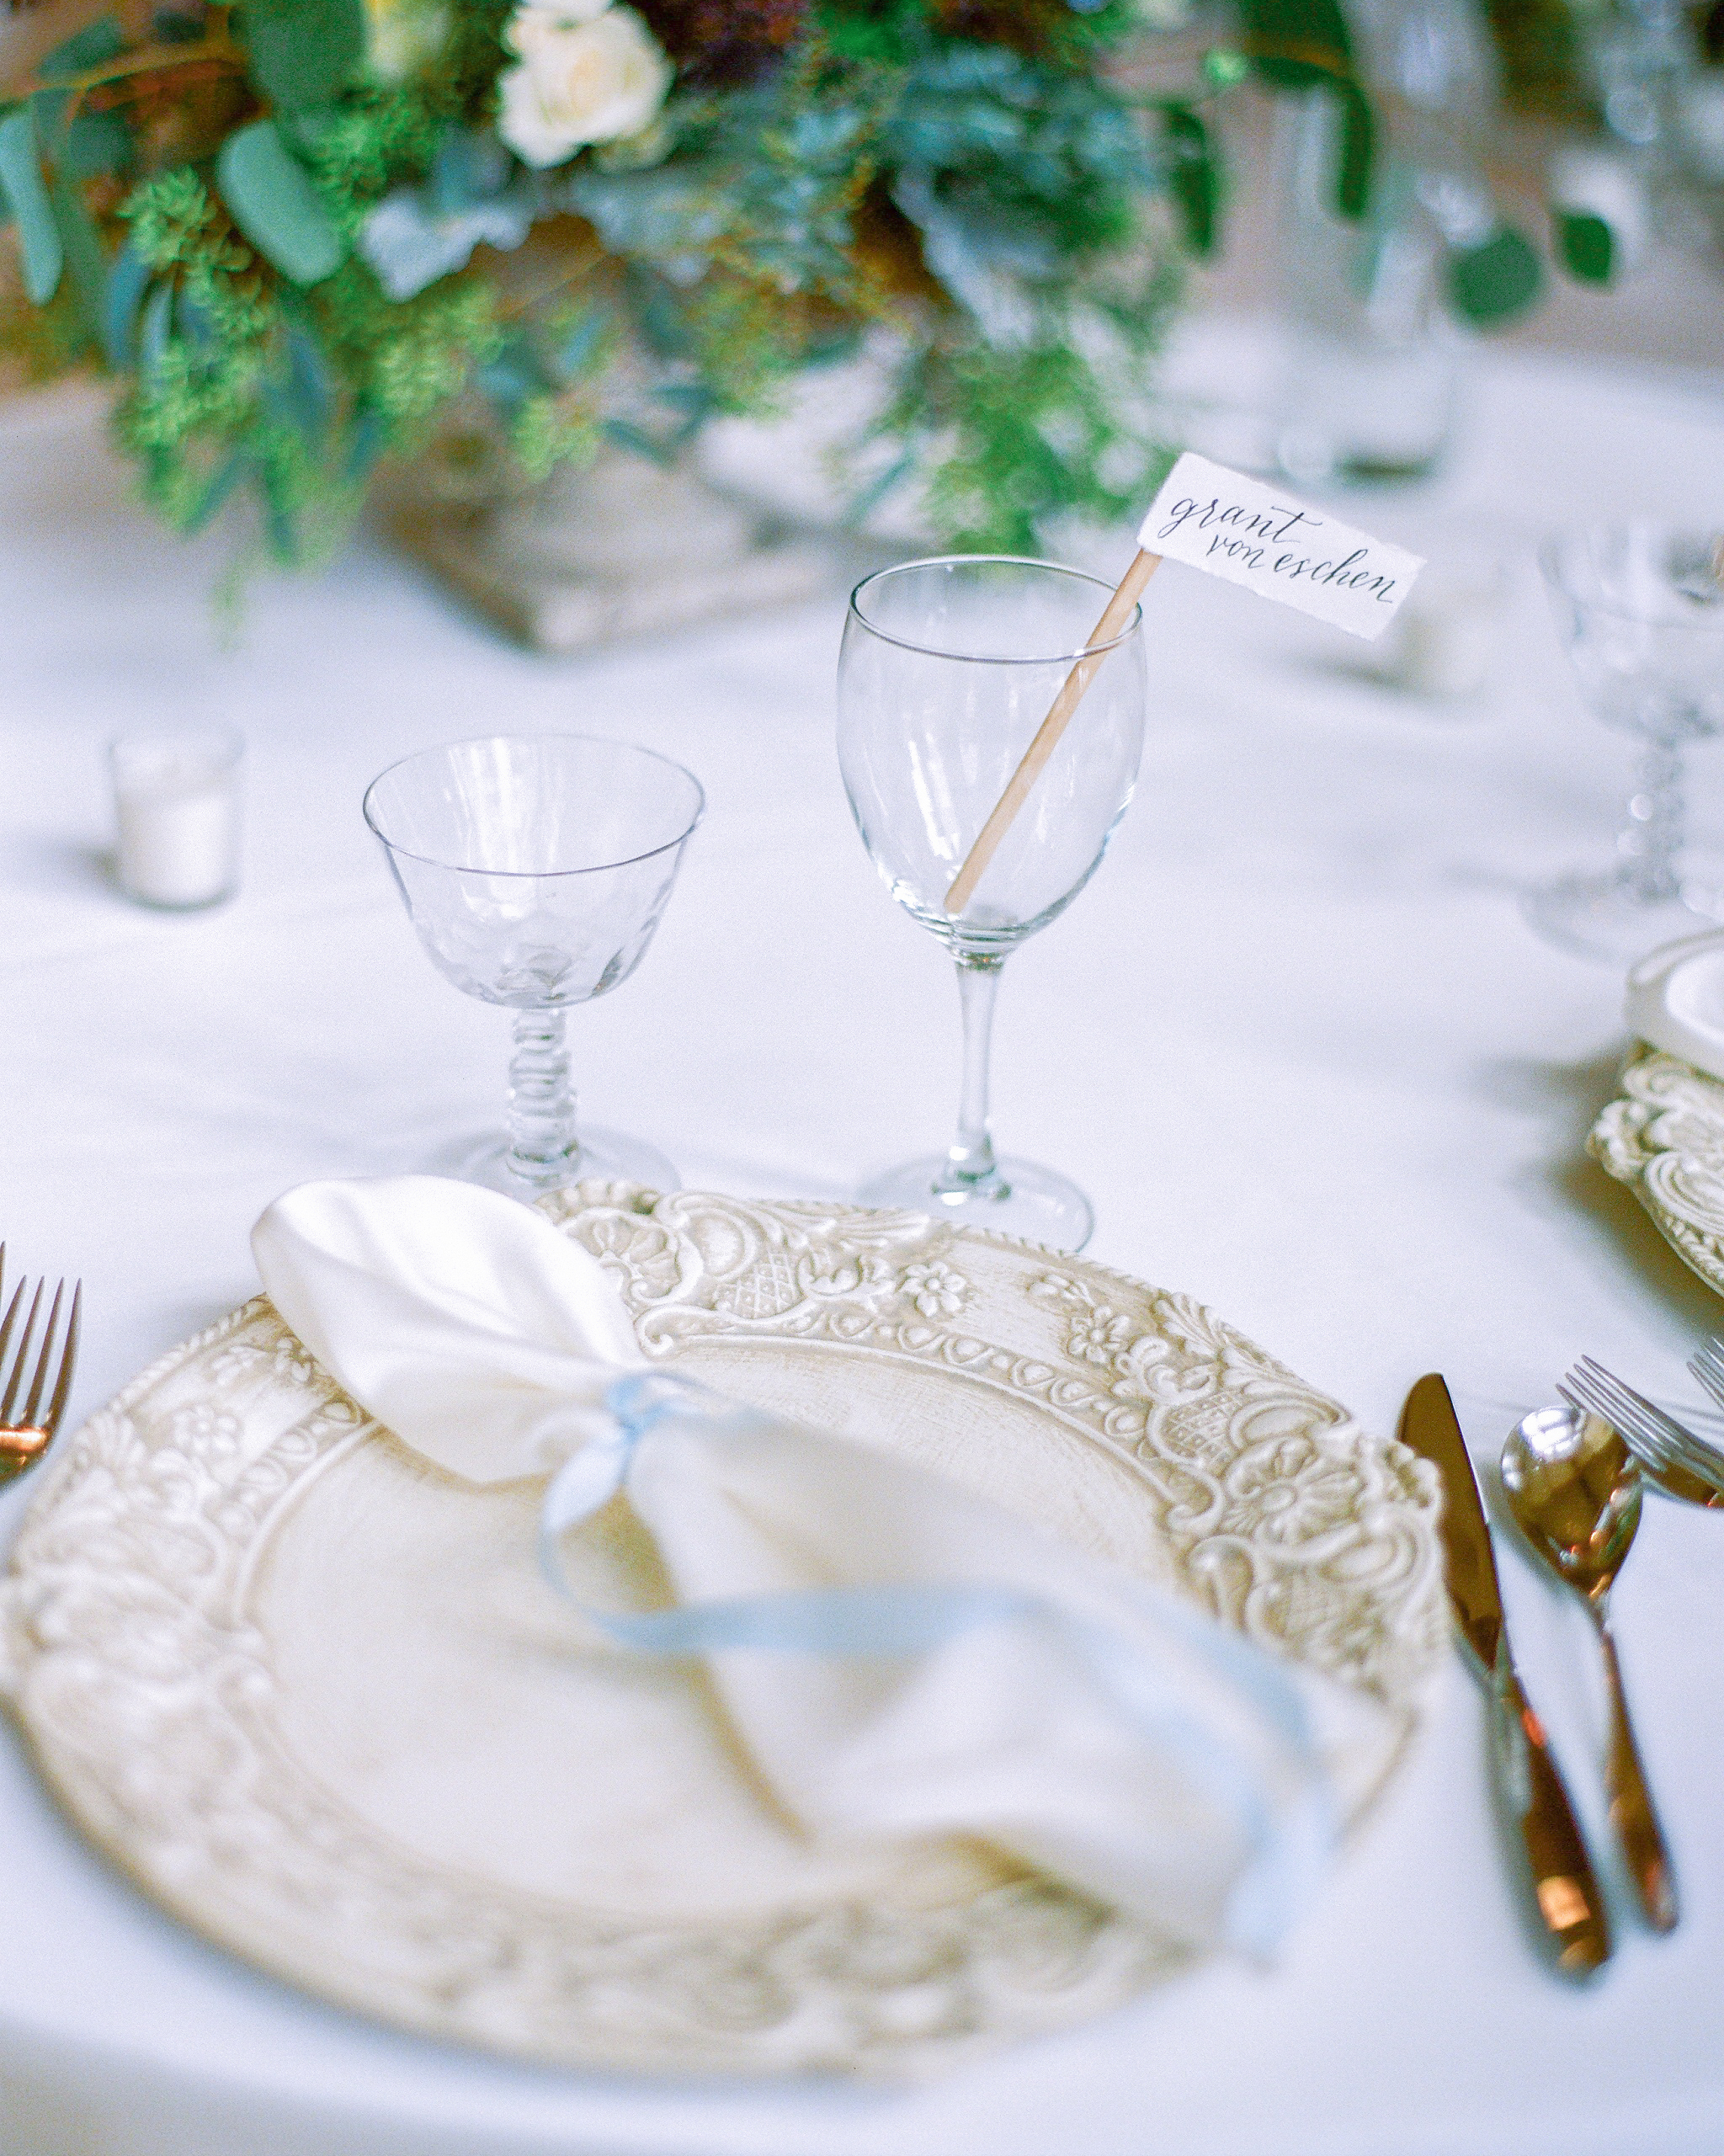 kendall-grant-wedding-placesetting-032-s112328-1215.jpg